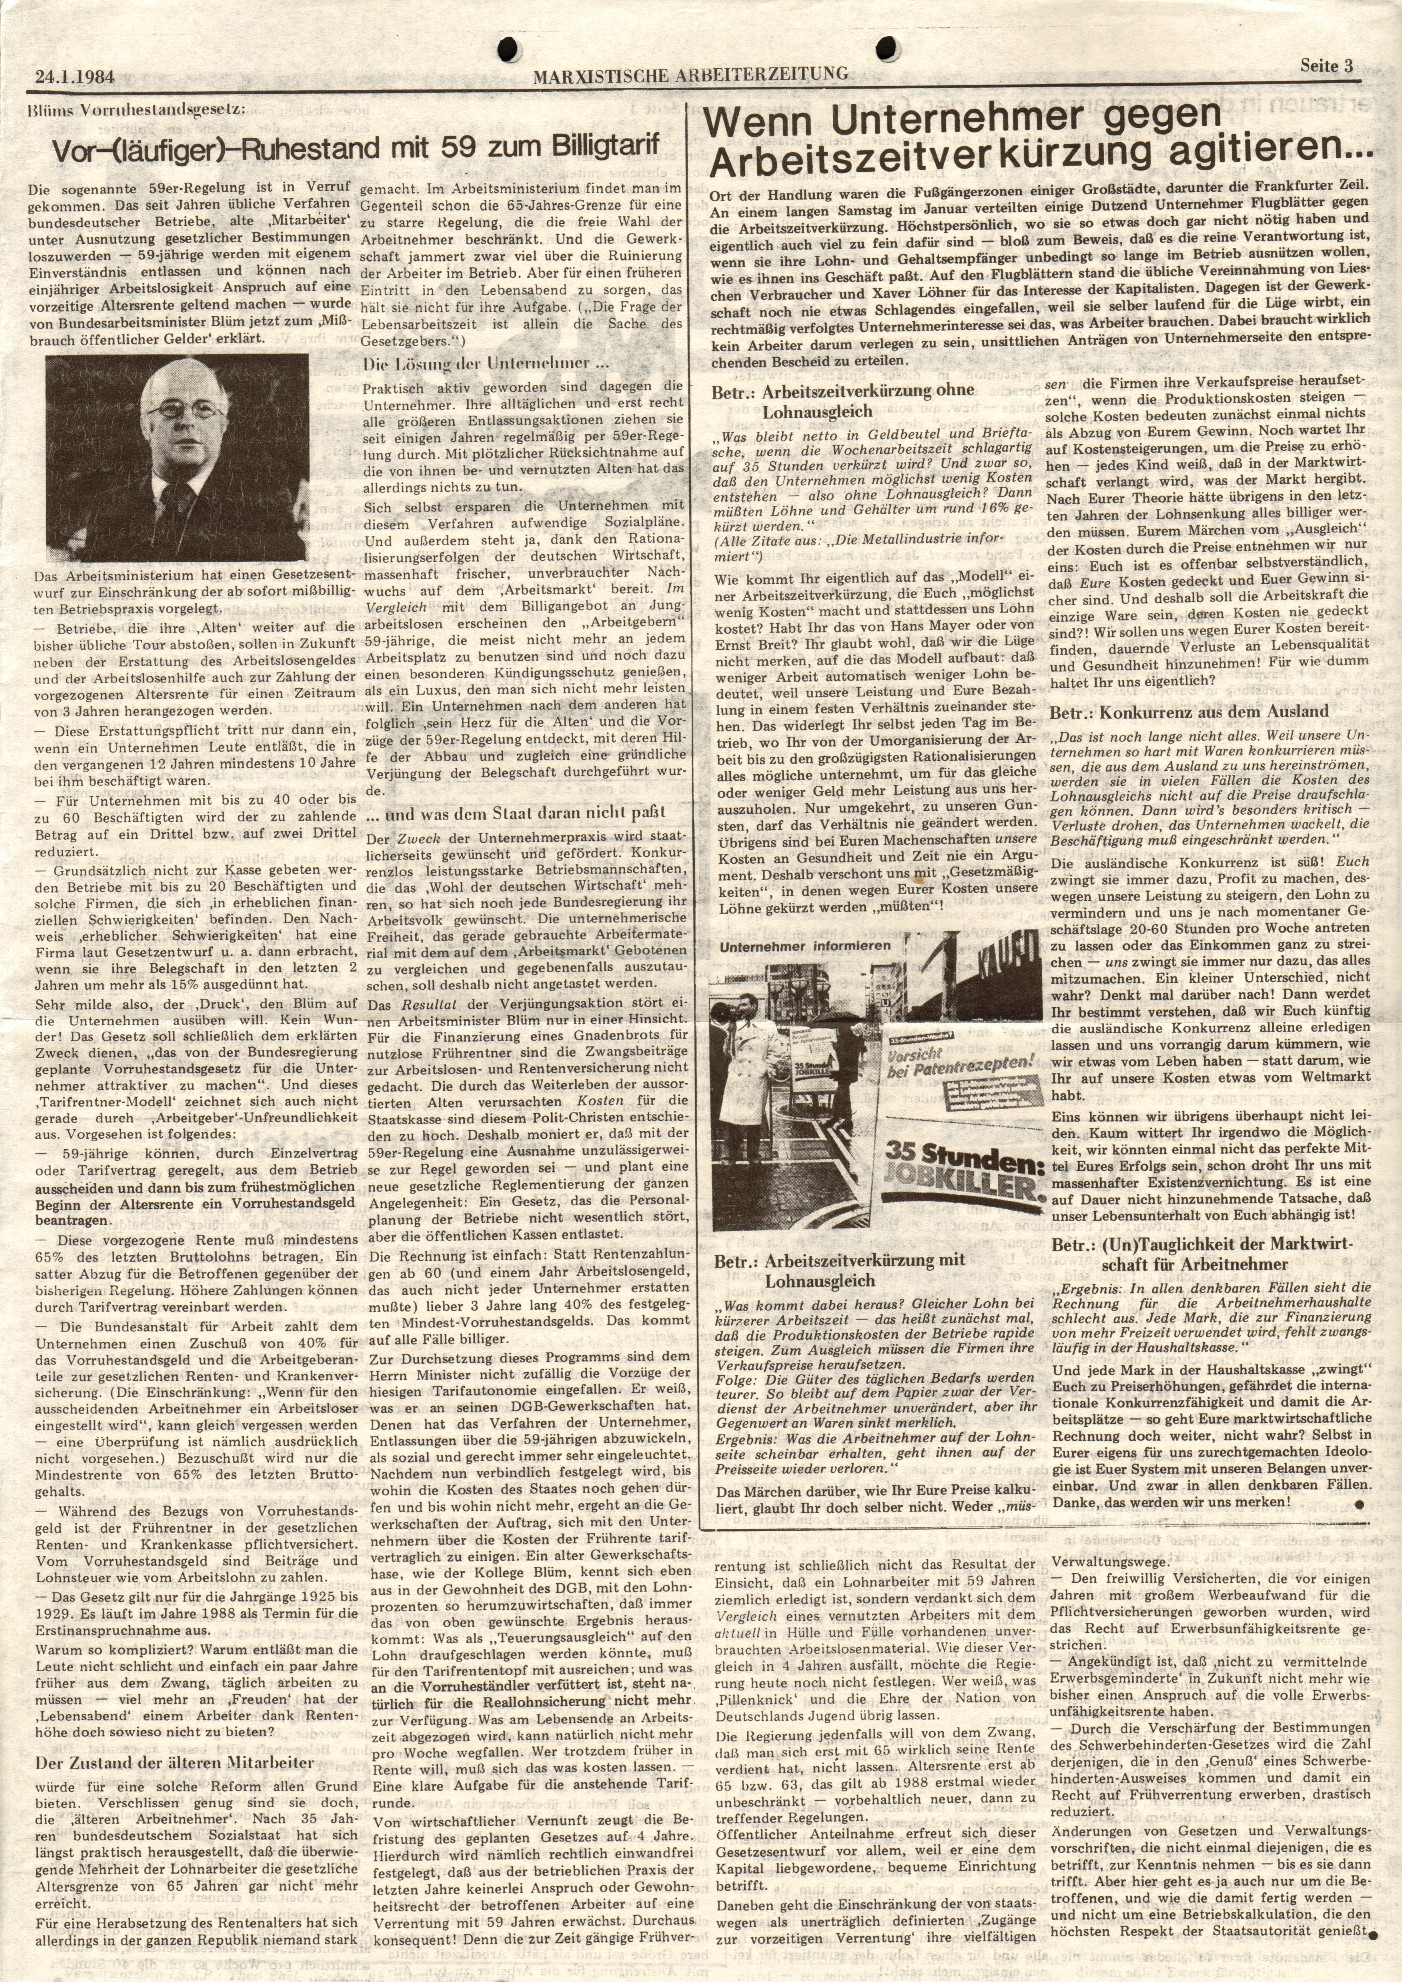 Ruesselsheim_MG_Marxistische_Arbeiterzeitung_Opel_19840126_03